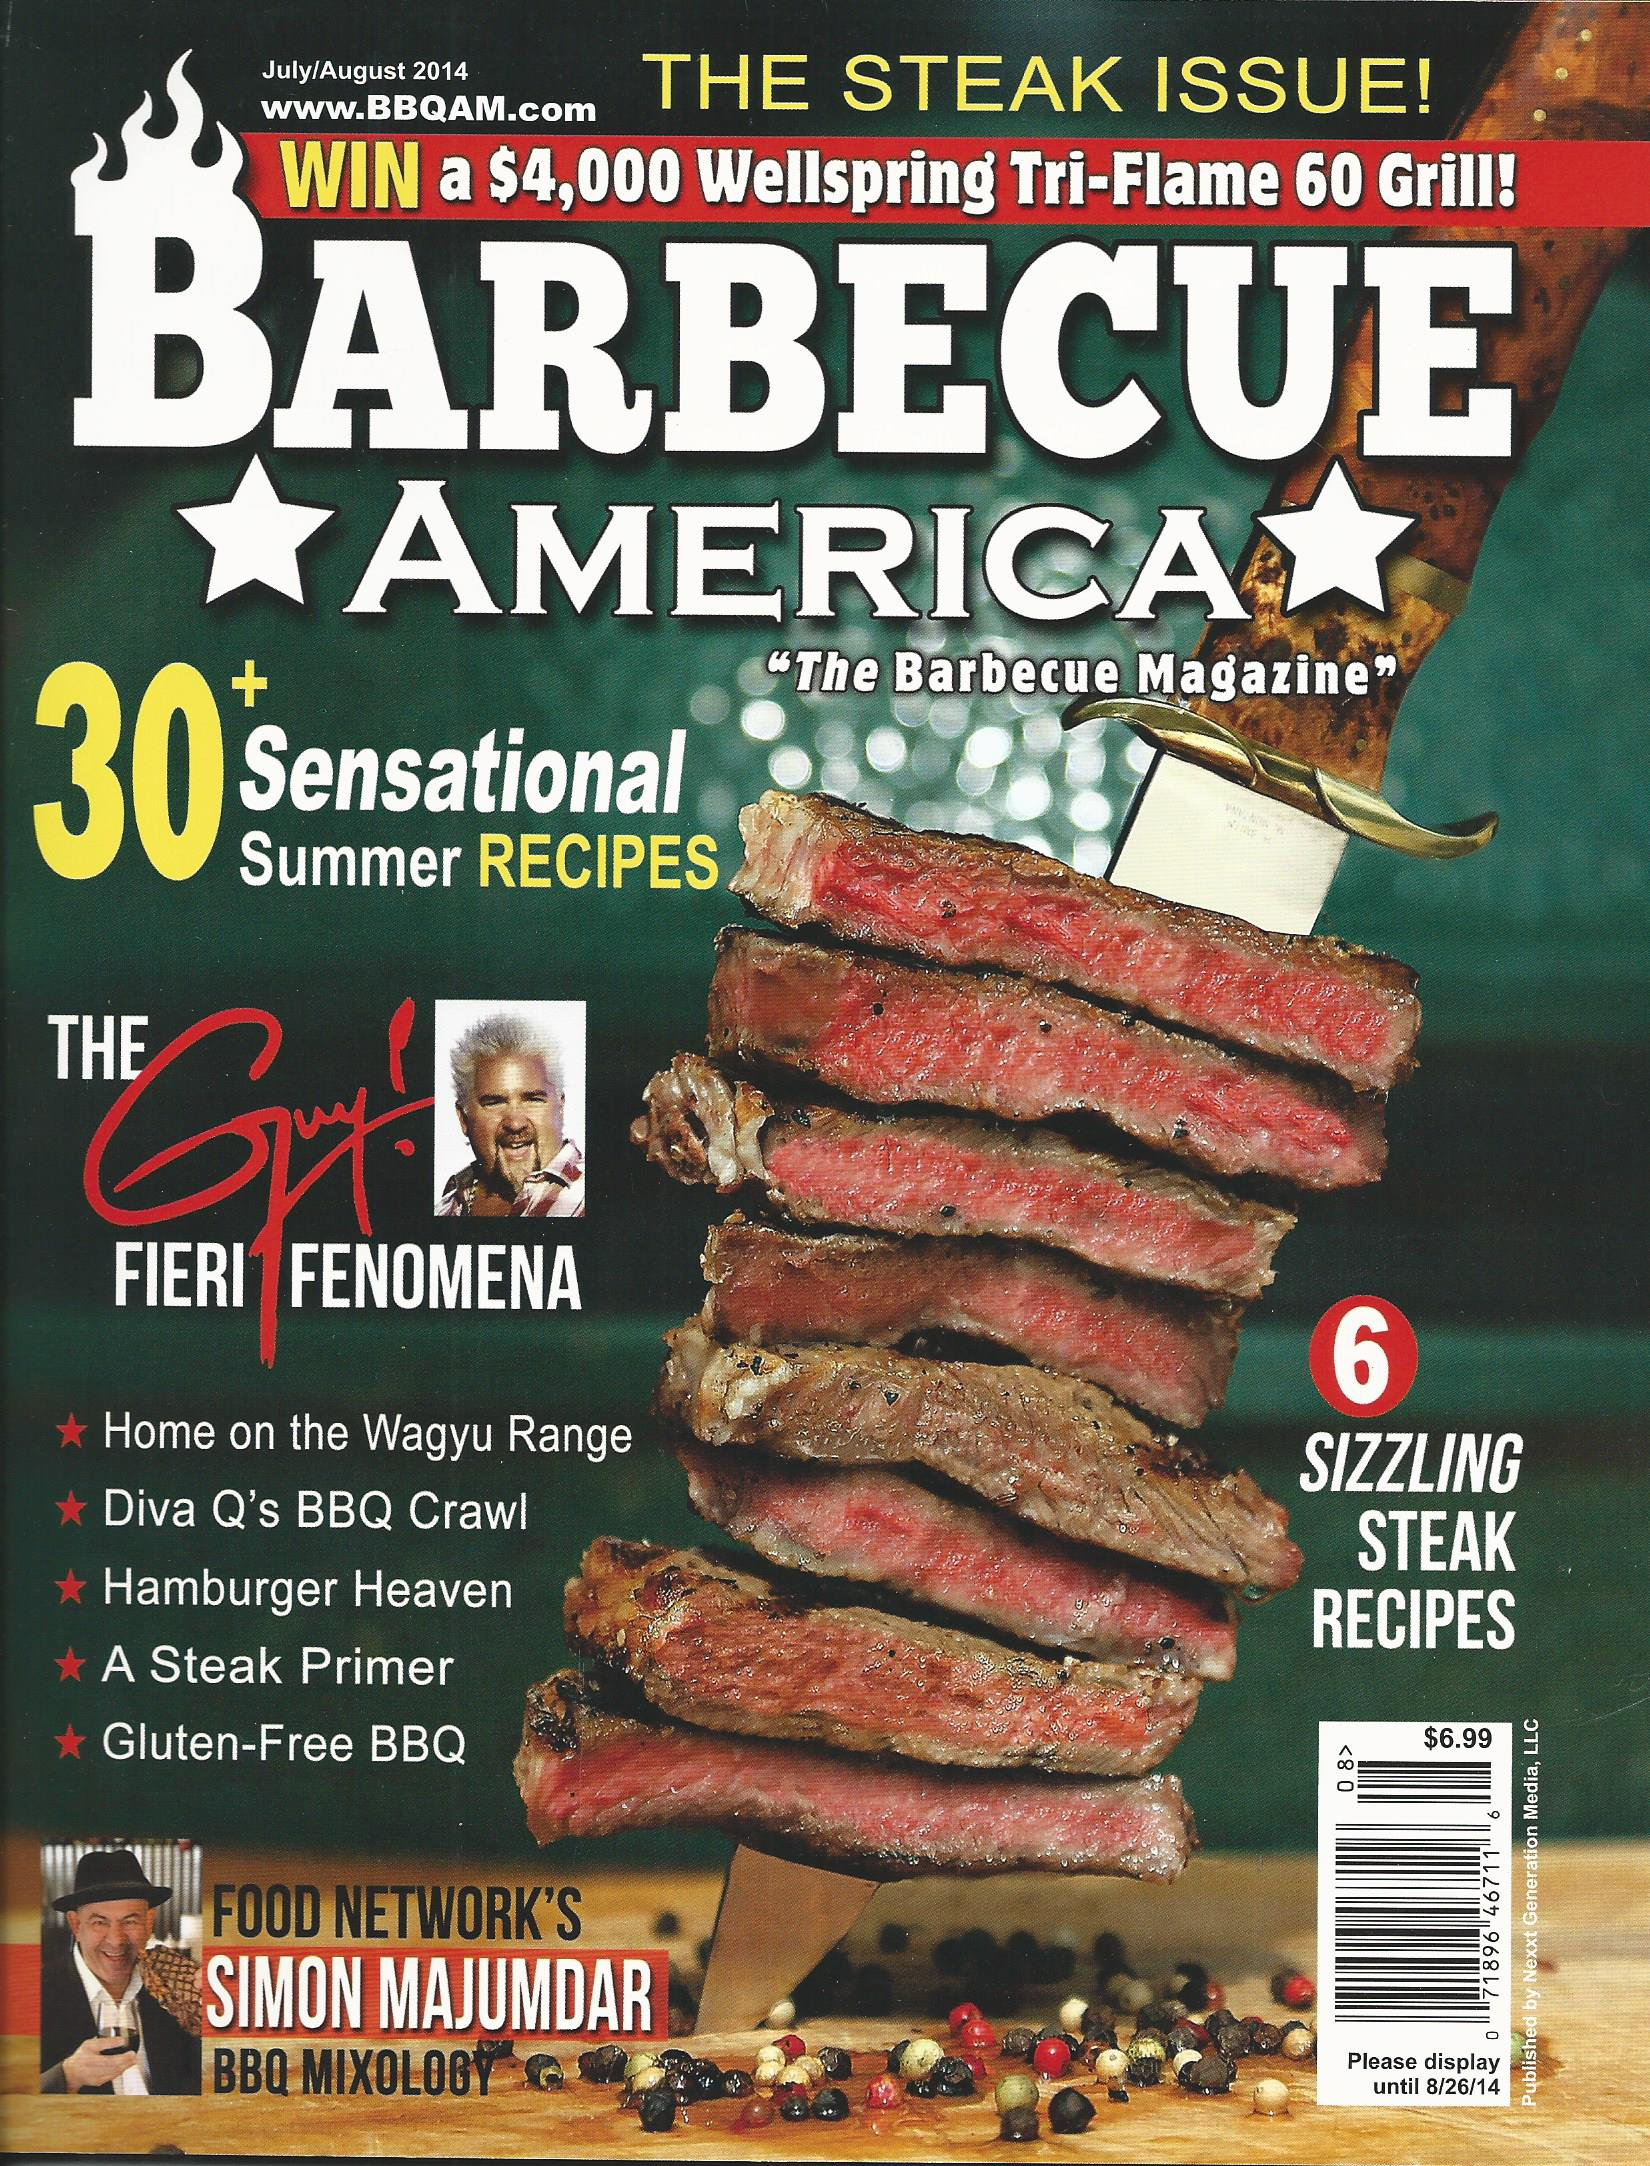 barbecue-magazine0001.jpg